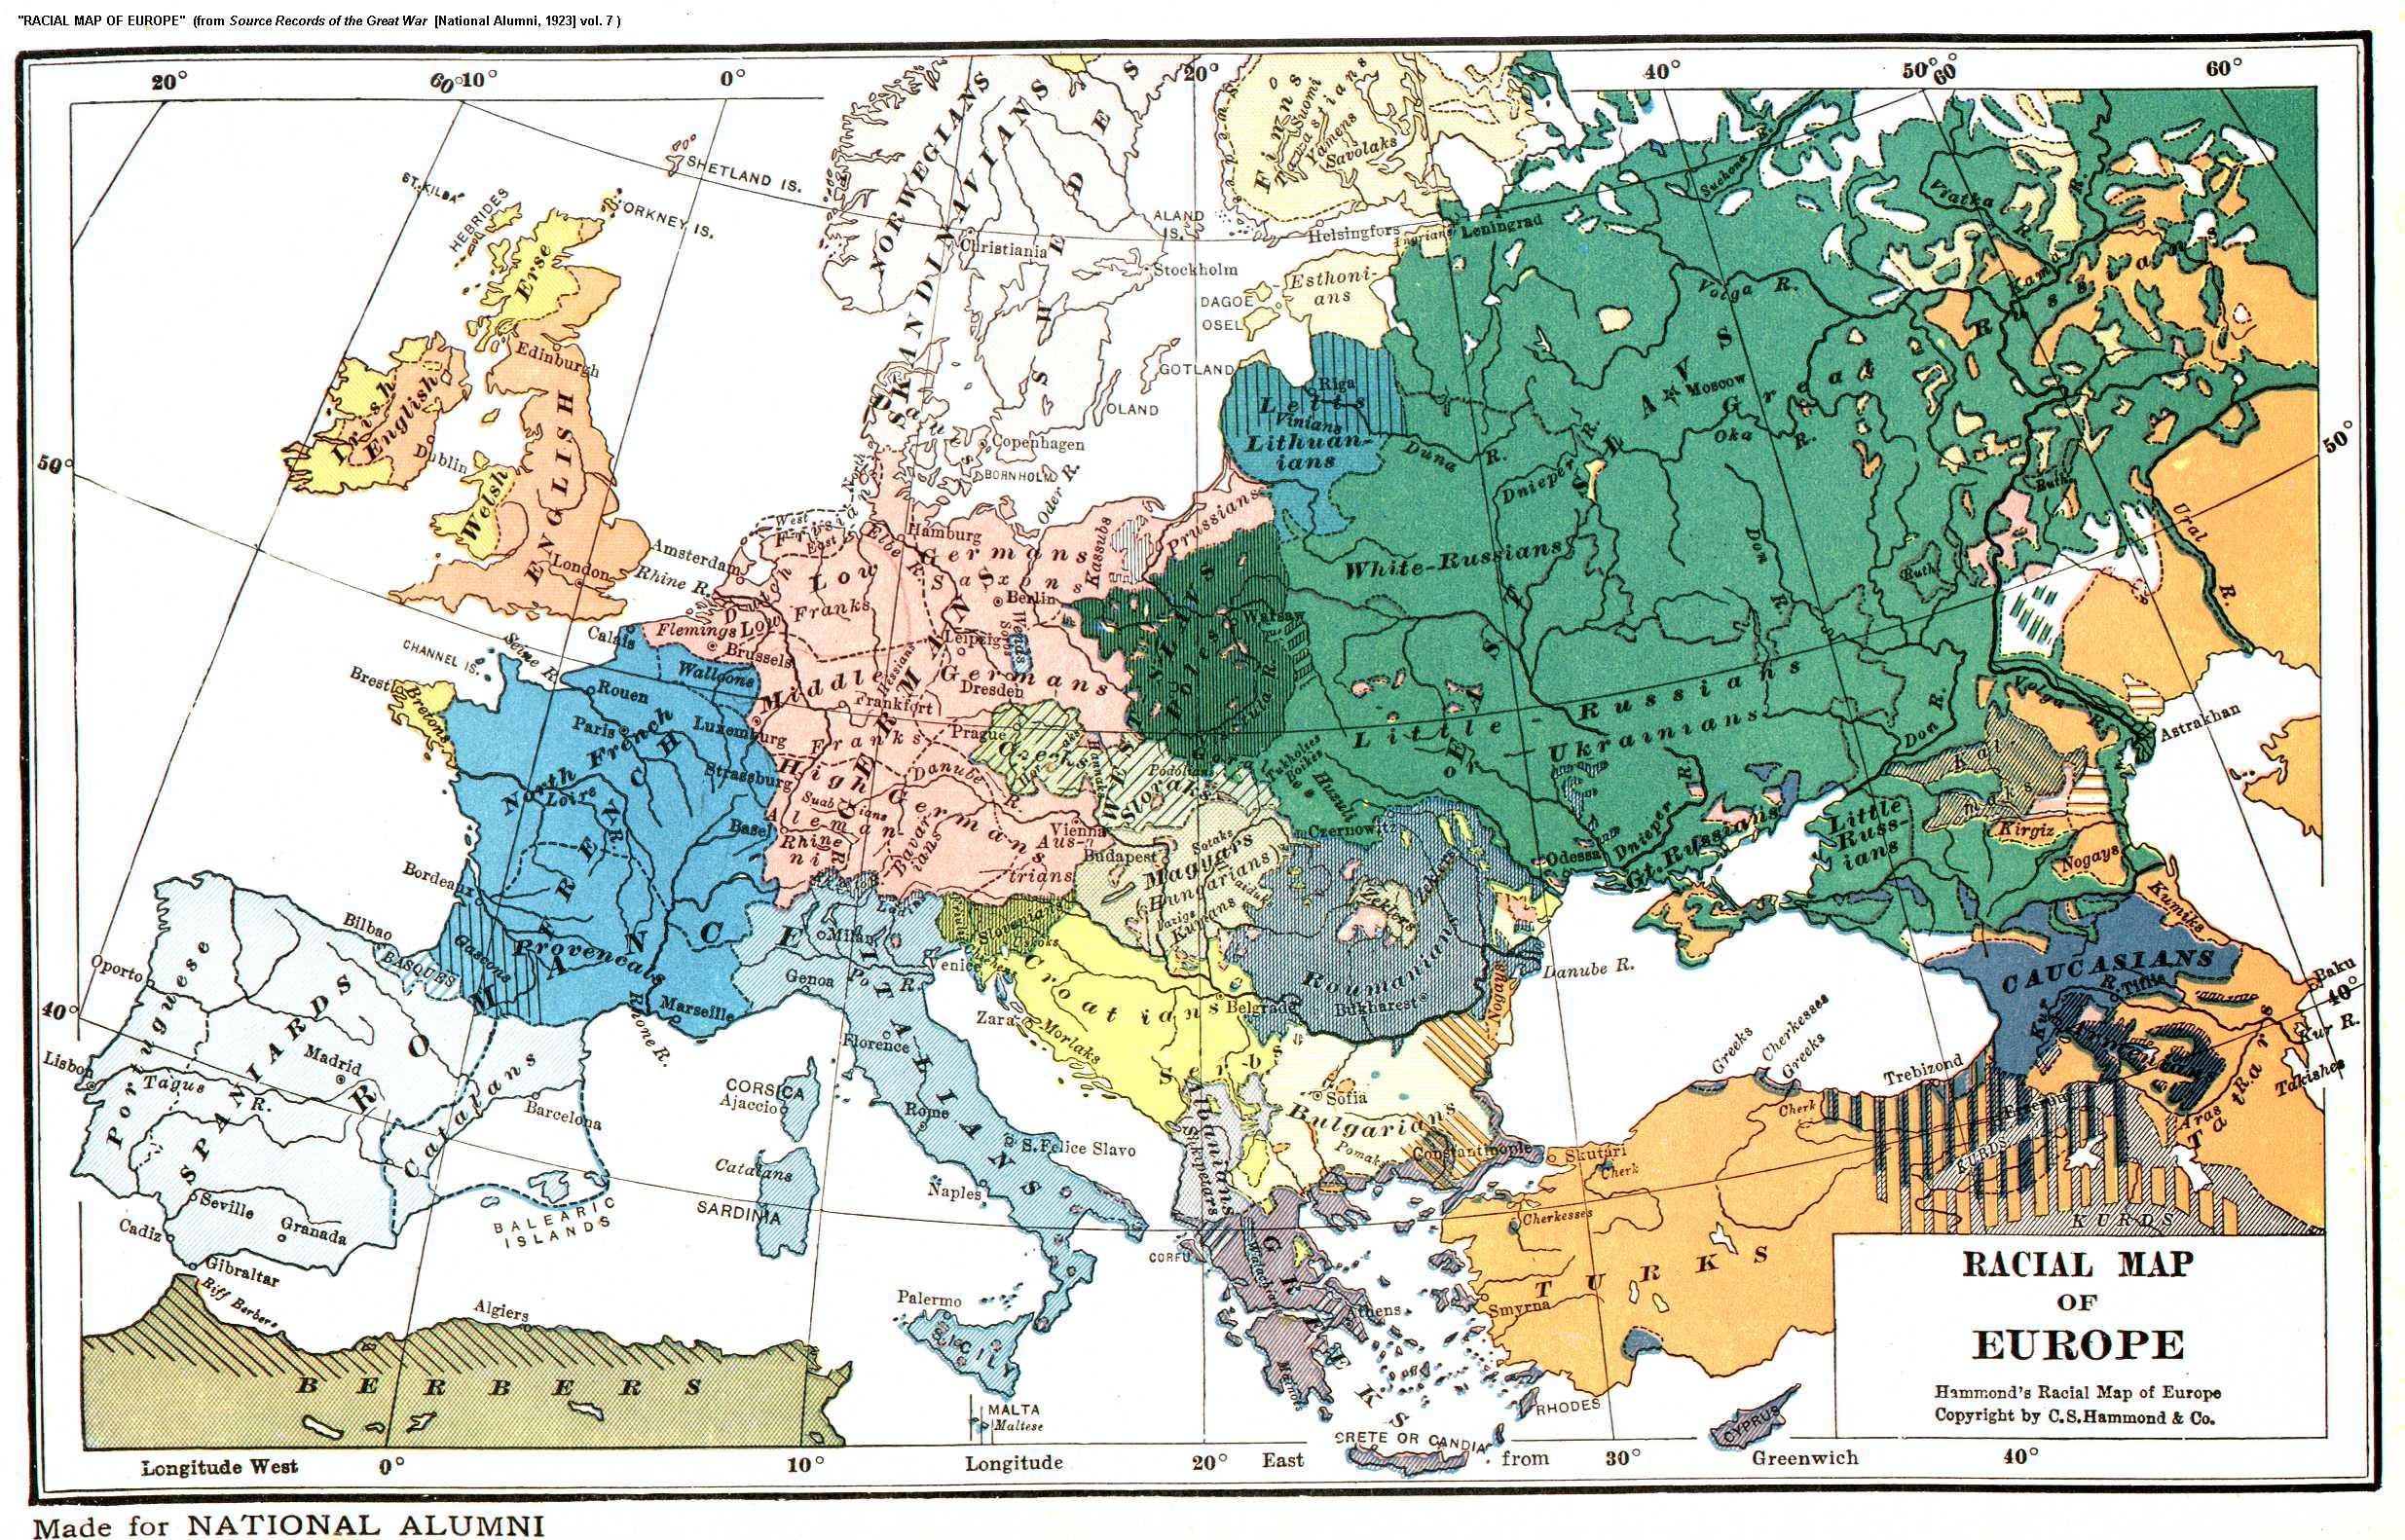 Racial Ethnic Map Of Europe 1919